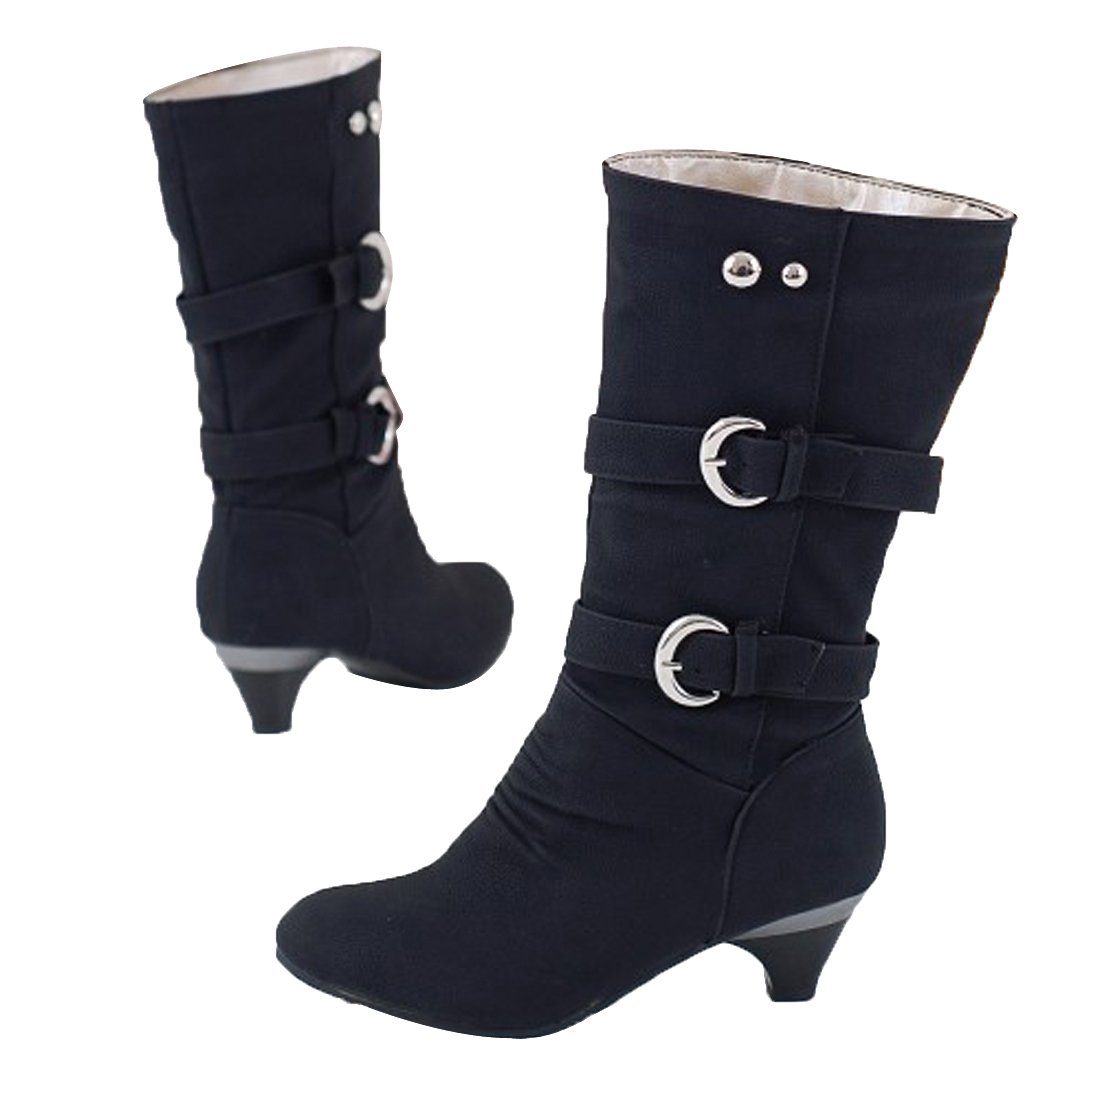 5e52c93d993 Inornever Women s Autumn Round Toe Mid Calf Dress Boots Trendy Buckle  Straps Kitten Heel Knee High Boots Black 9 B (M) US